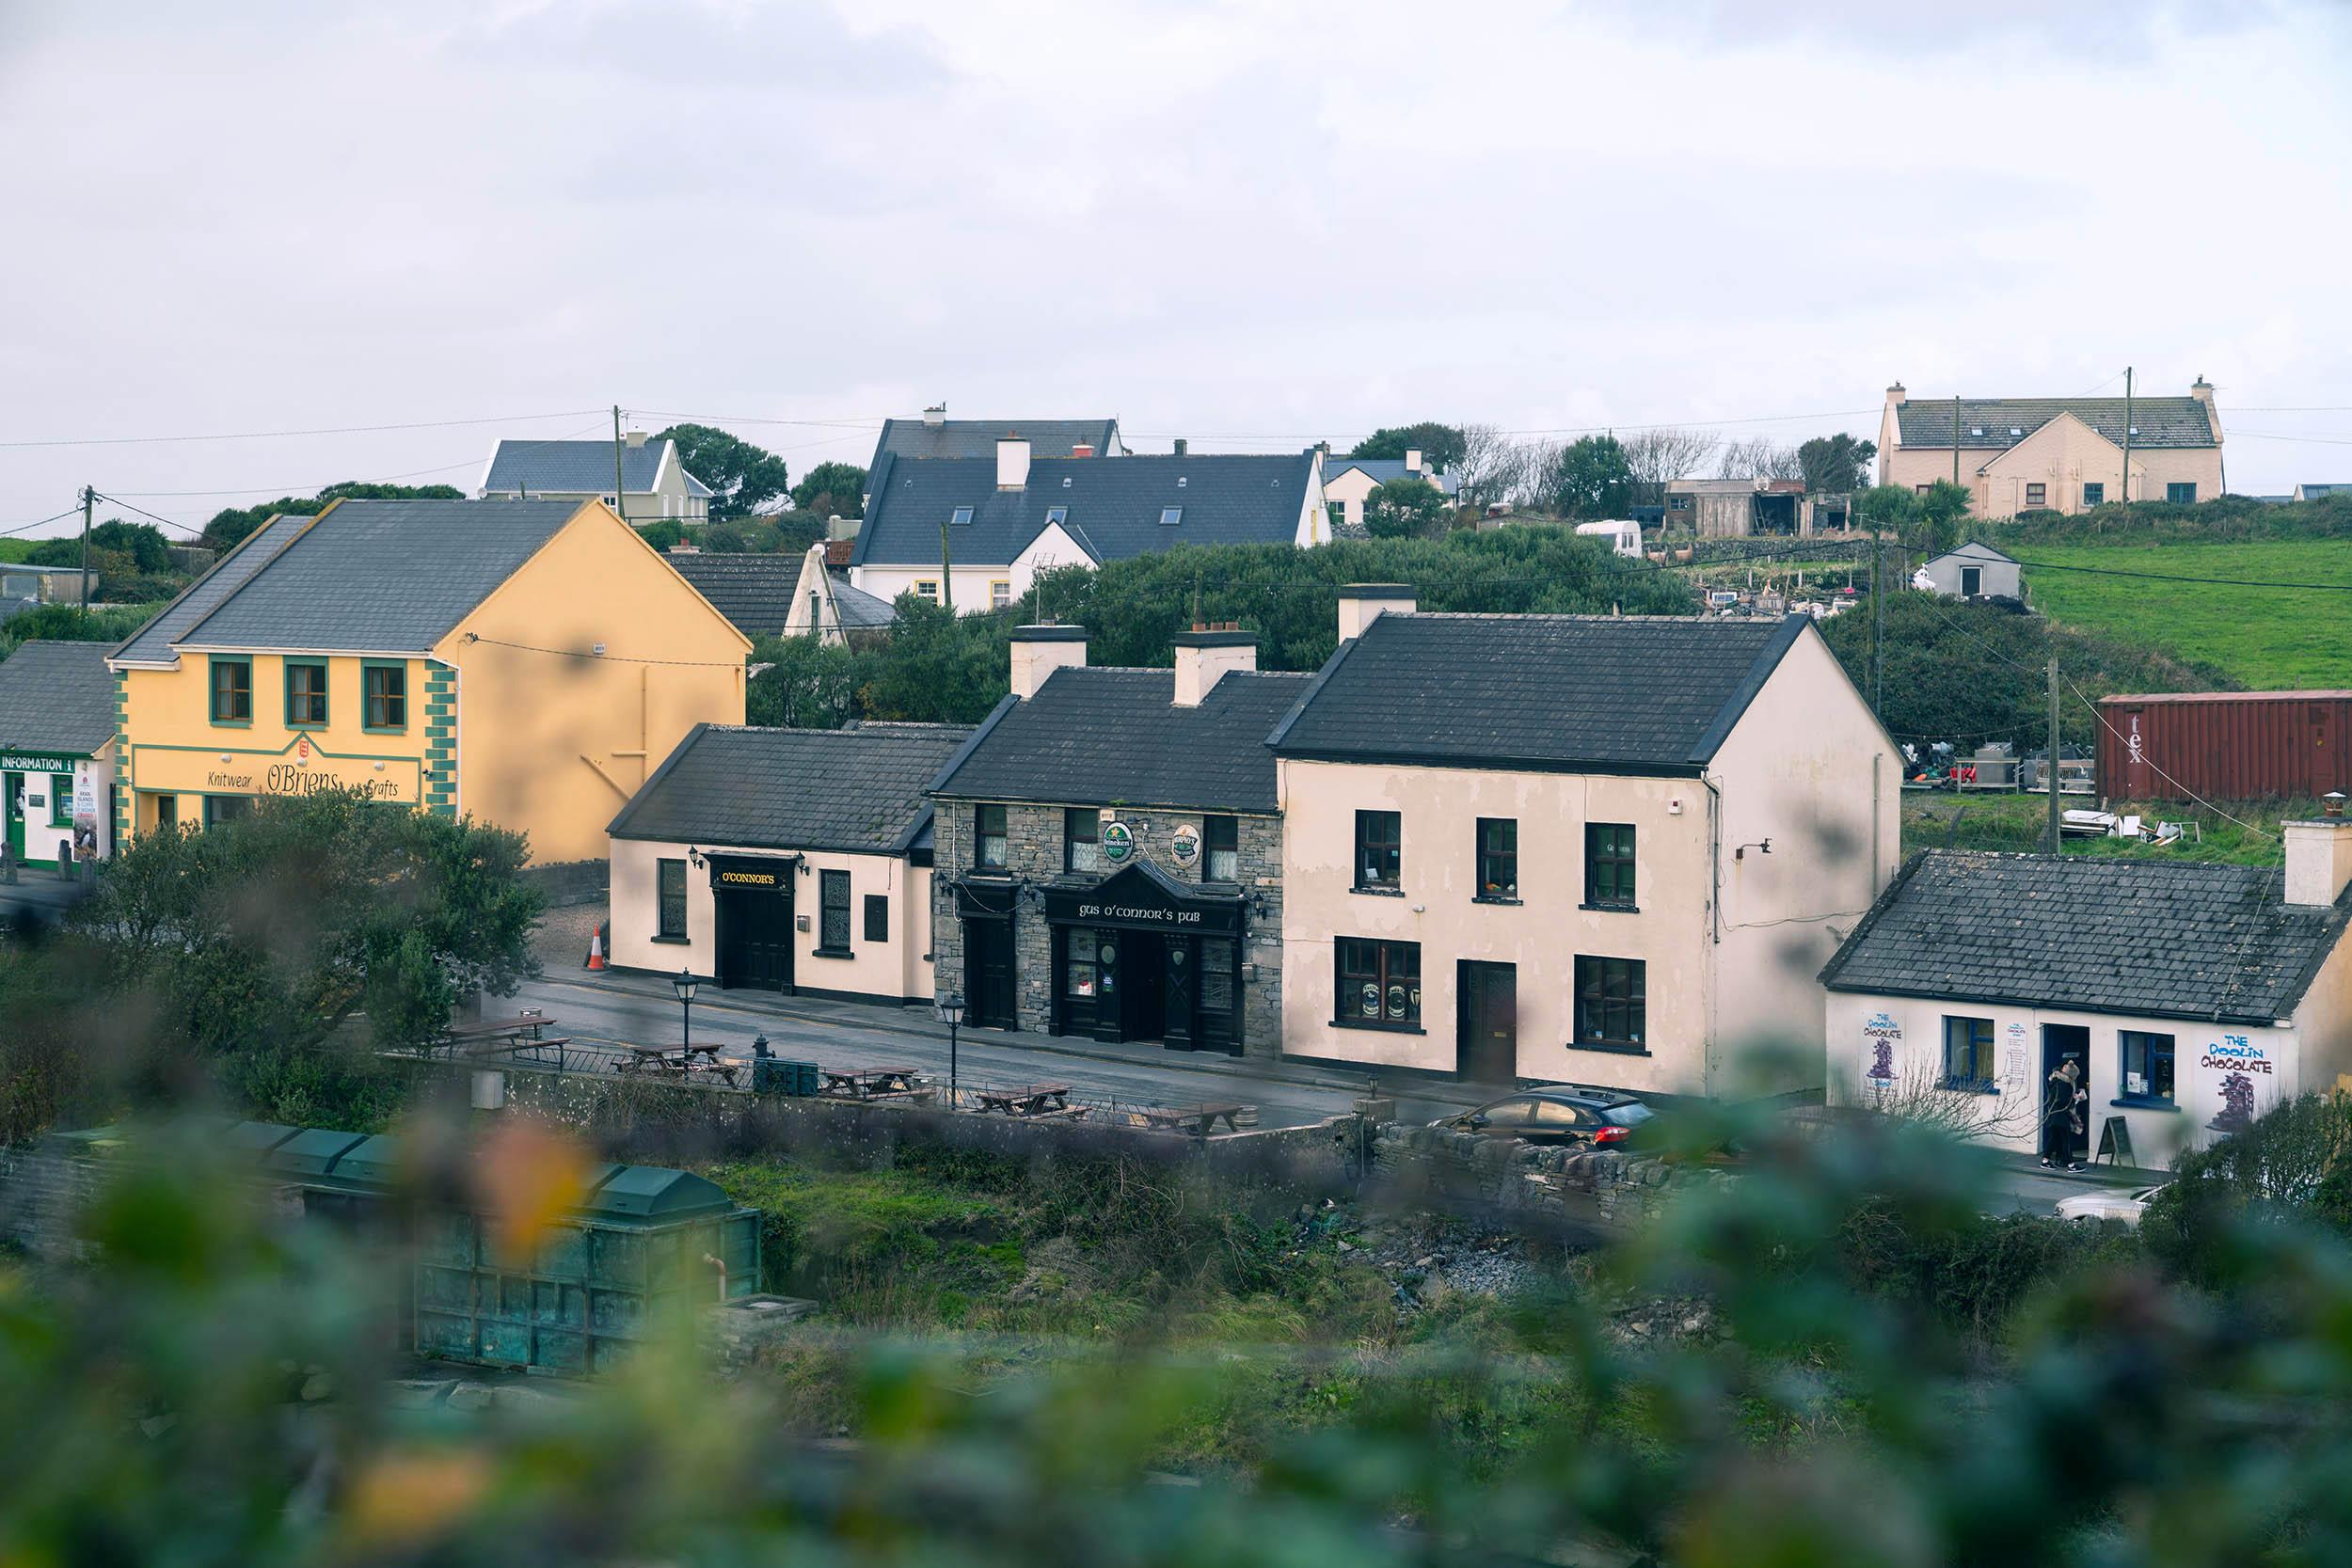 IRELAND_CLARE_DOOLIN_0008